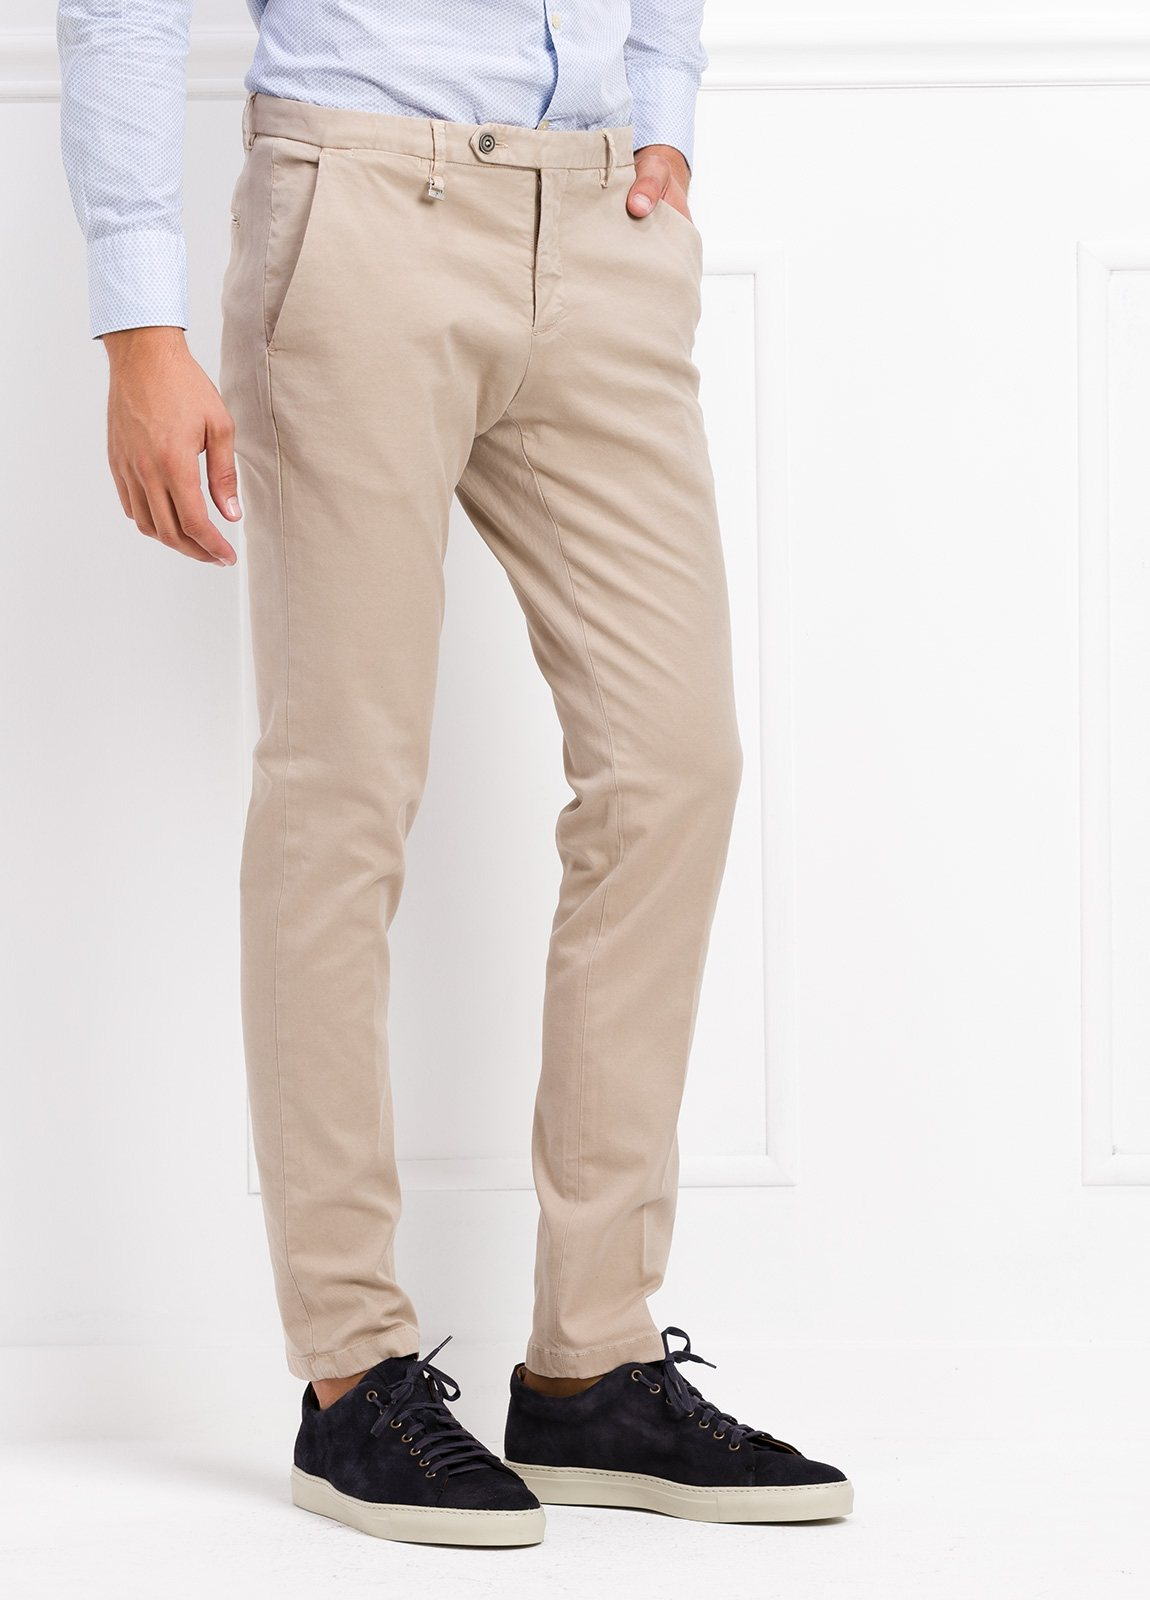 Pantalón modelo slim fit color beige. 97% Algodón 3% Ea. - Ítem1